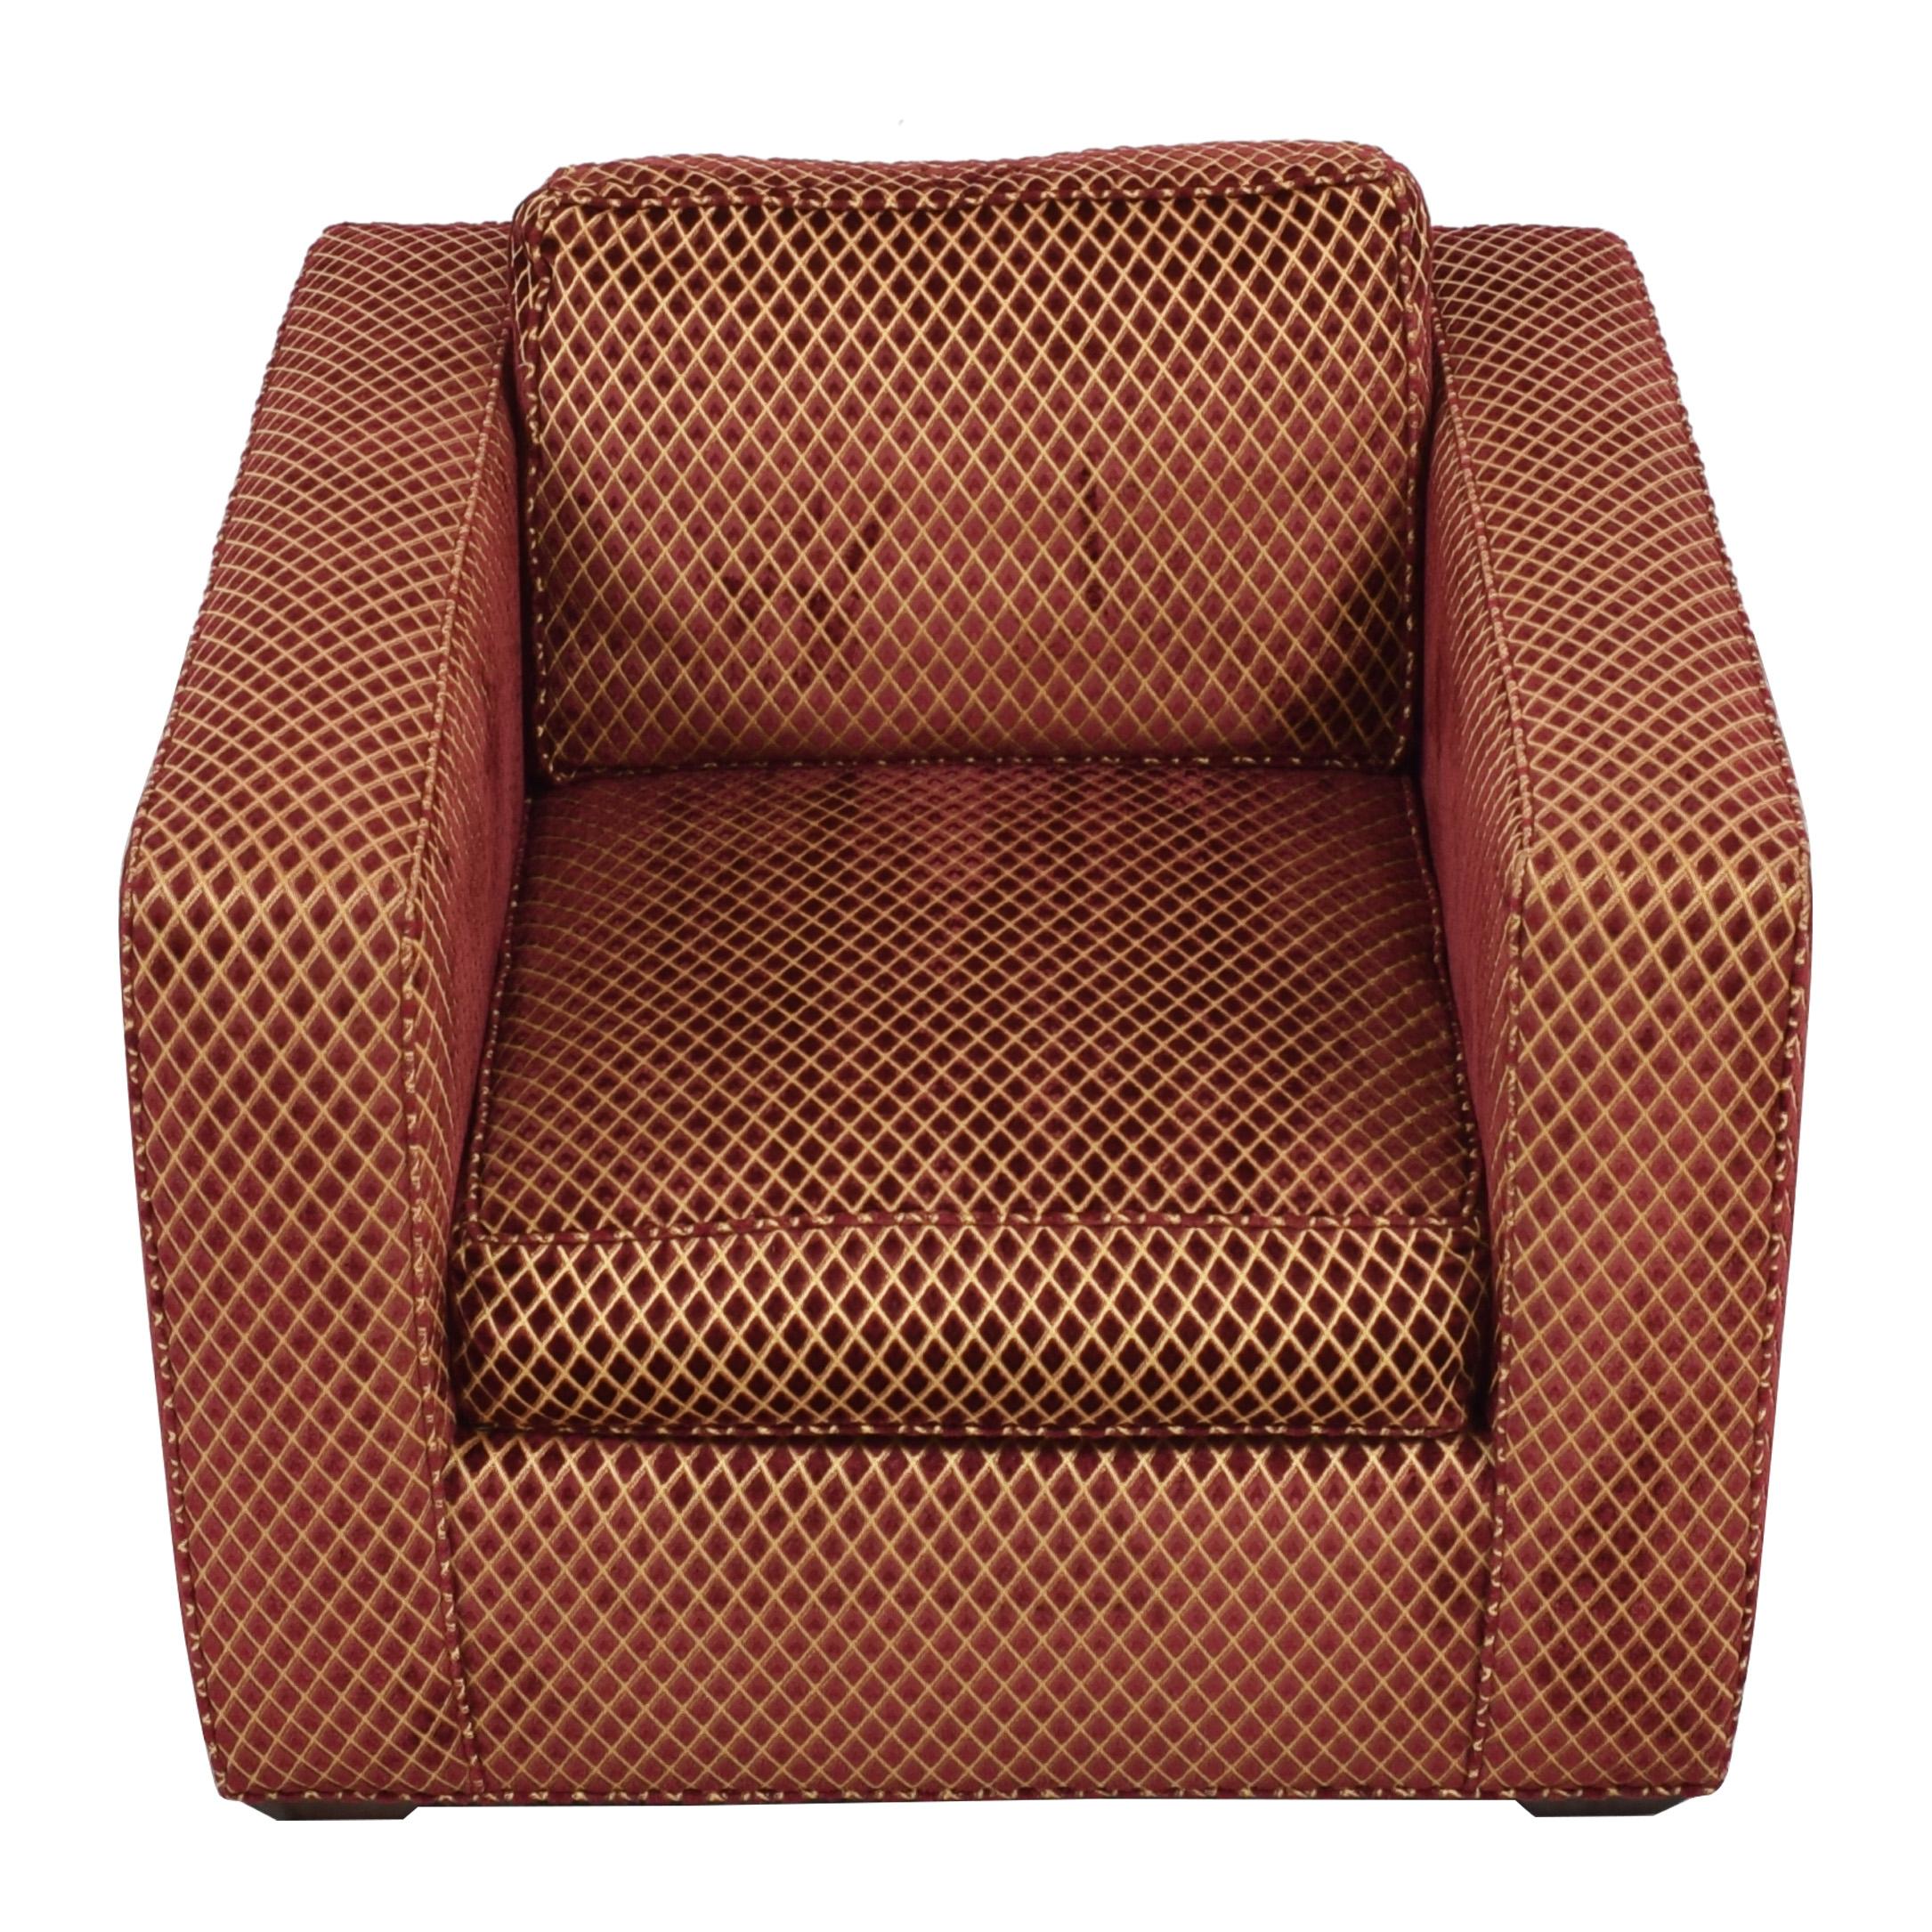 R.Jones R.Jones Club Lounge Chair